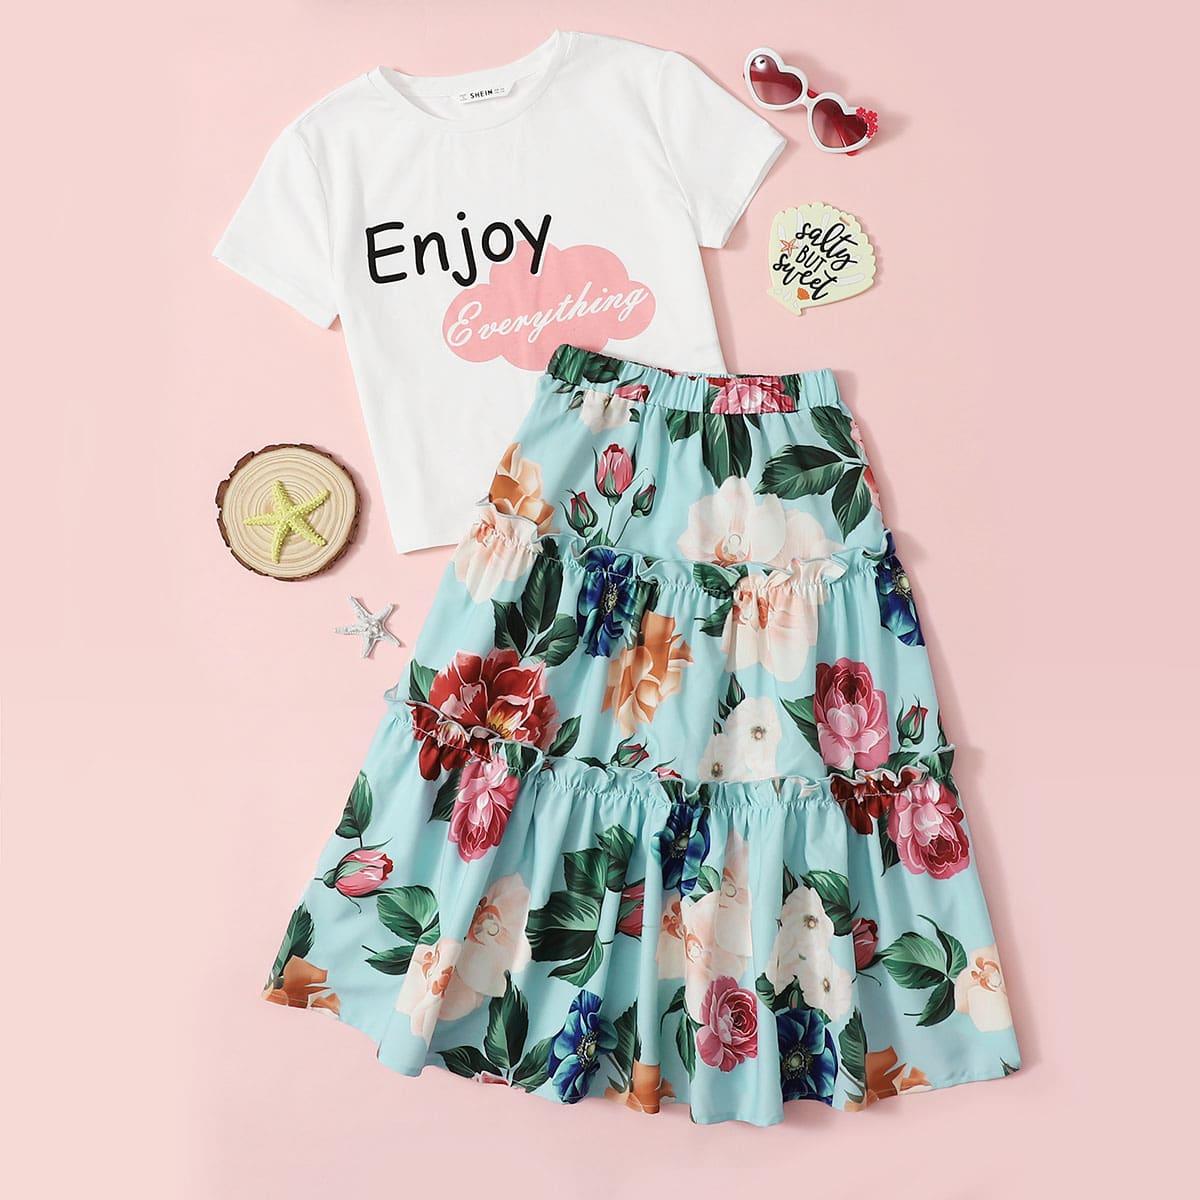 Girls Graphic Tee & Floral Print Ruffled Skirt Set